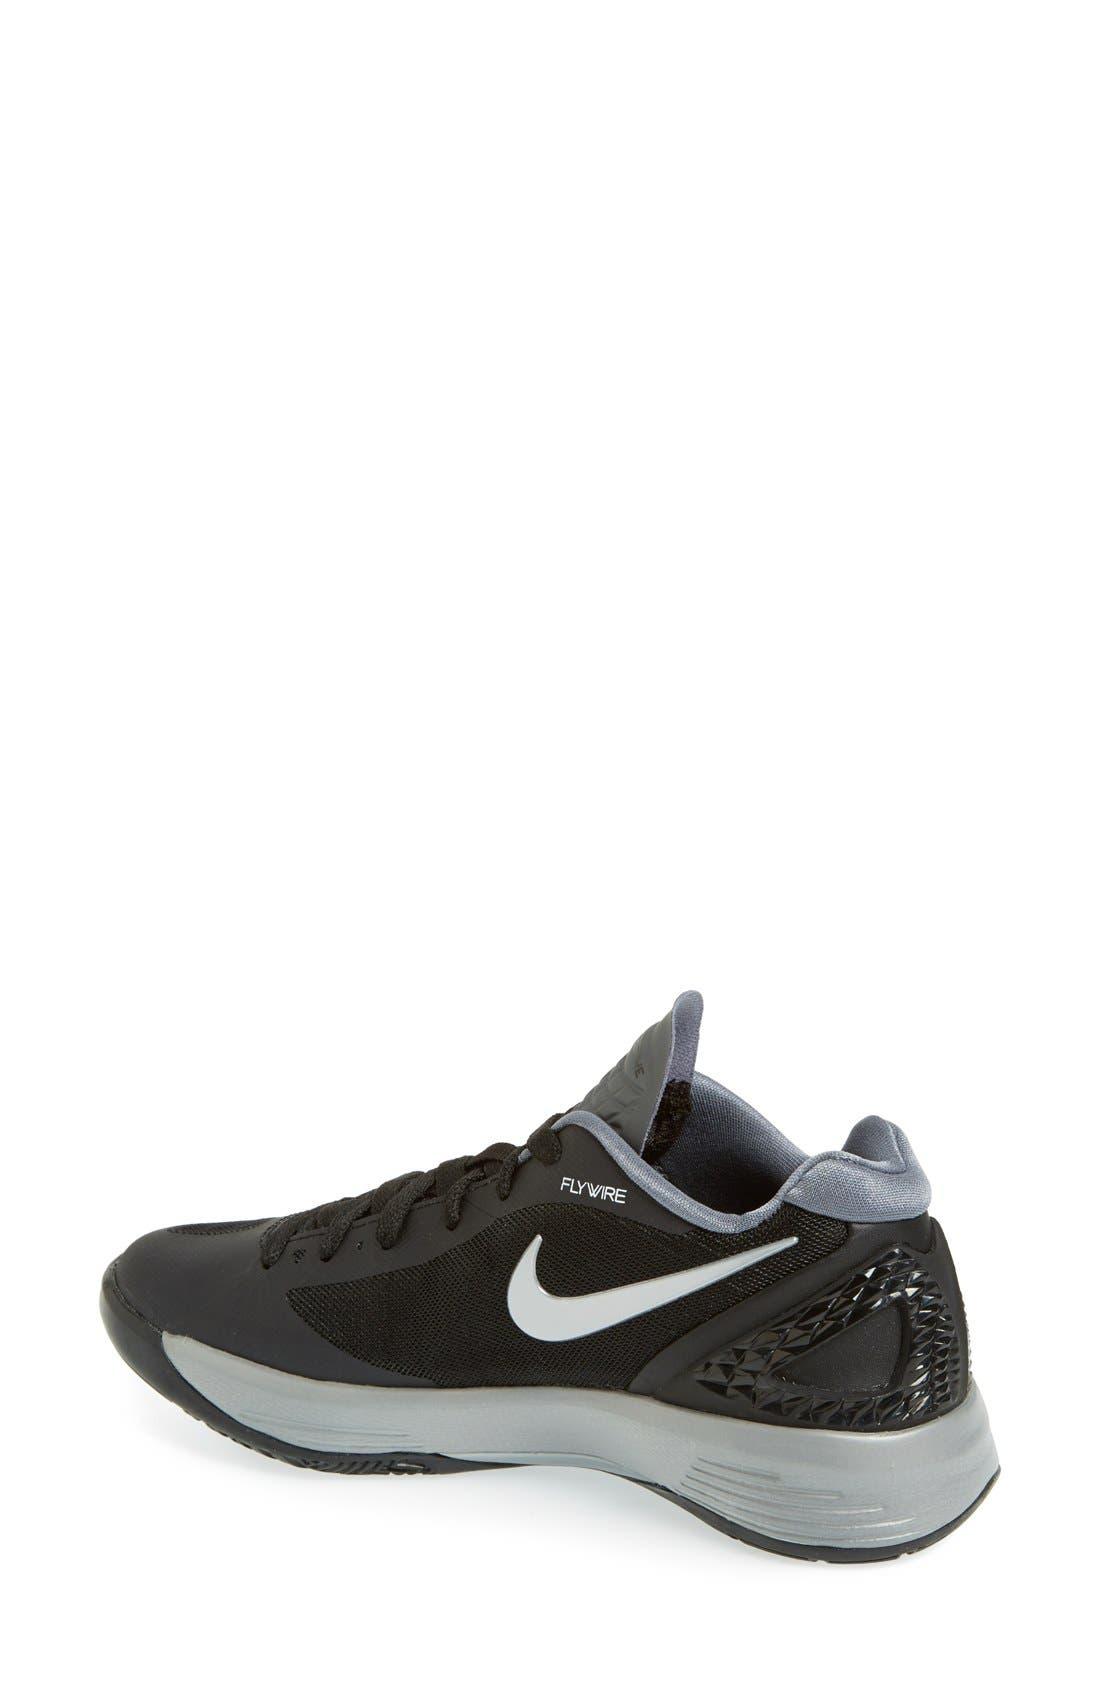 Alternate Image 2  - Nike 'Zoom Hyperspike' Volleyball Shoe (Women)